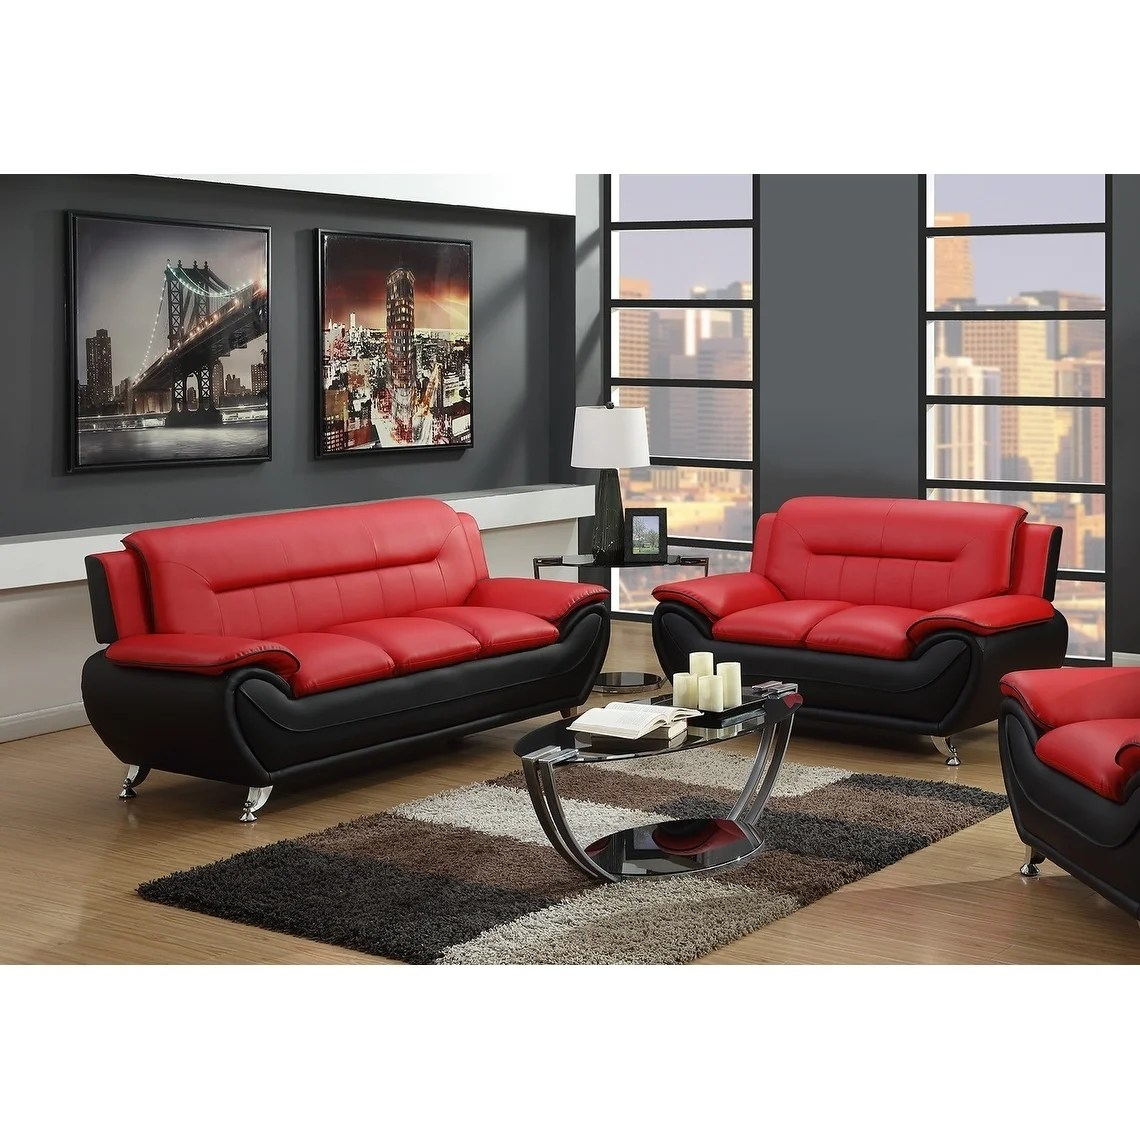 2pc red on black sofa loveseat set